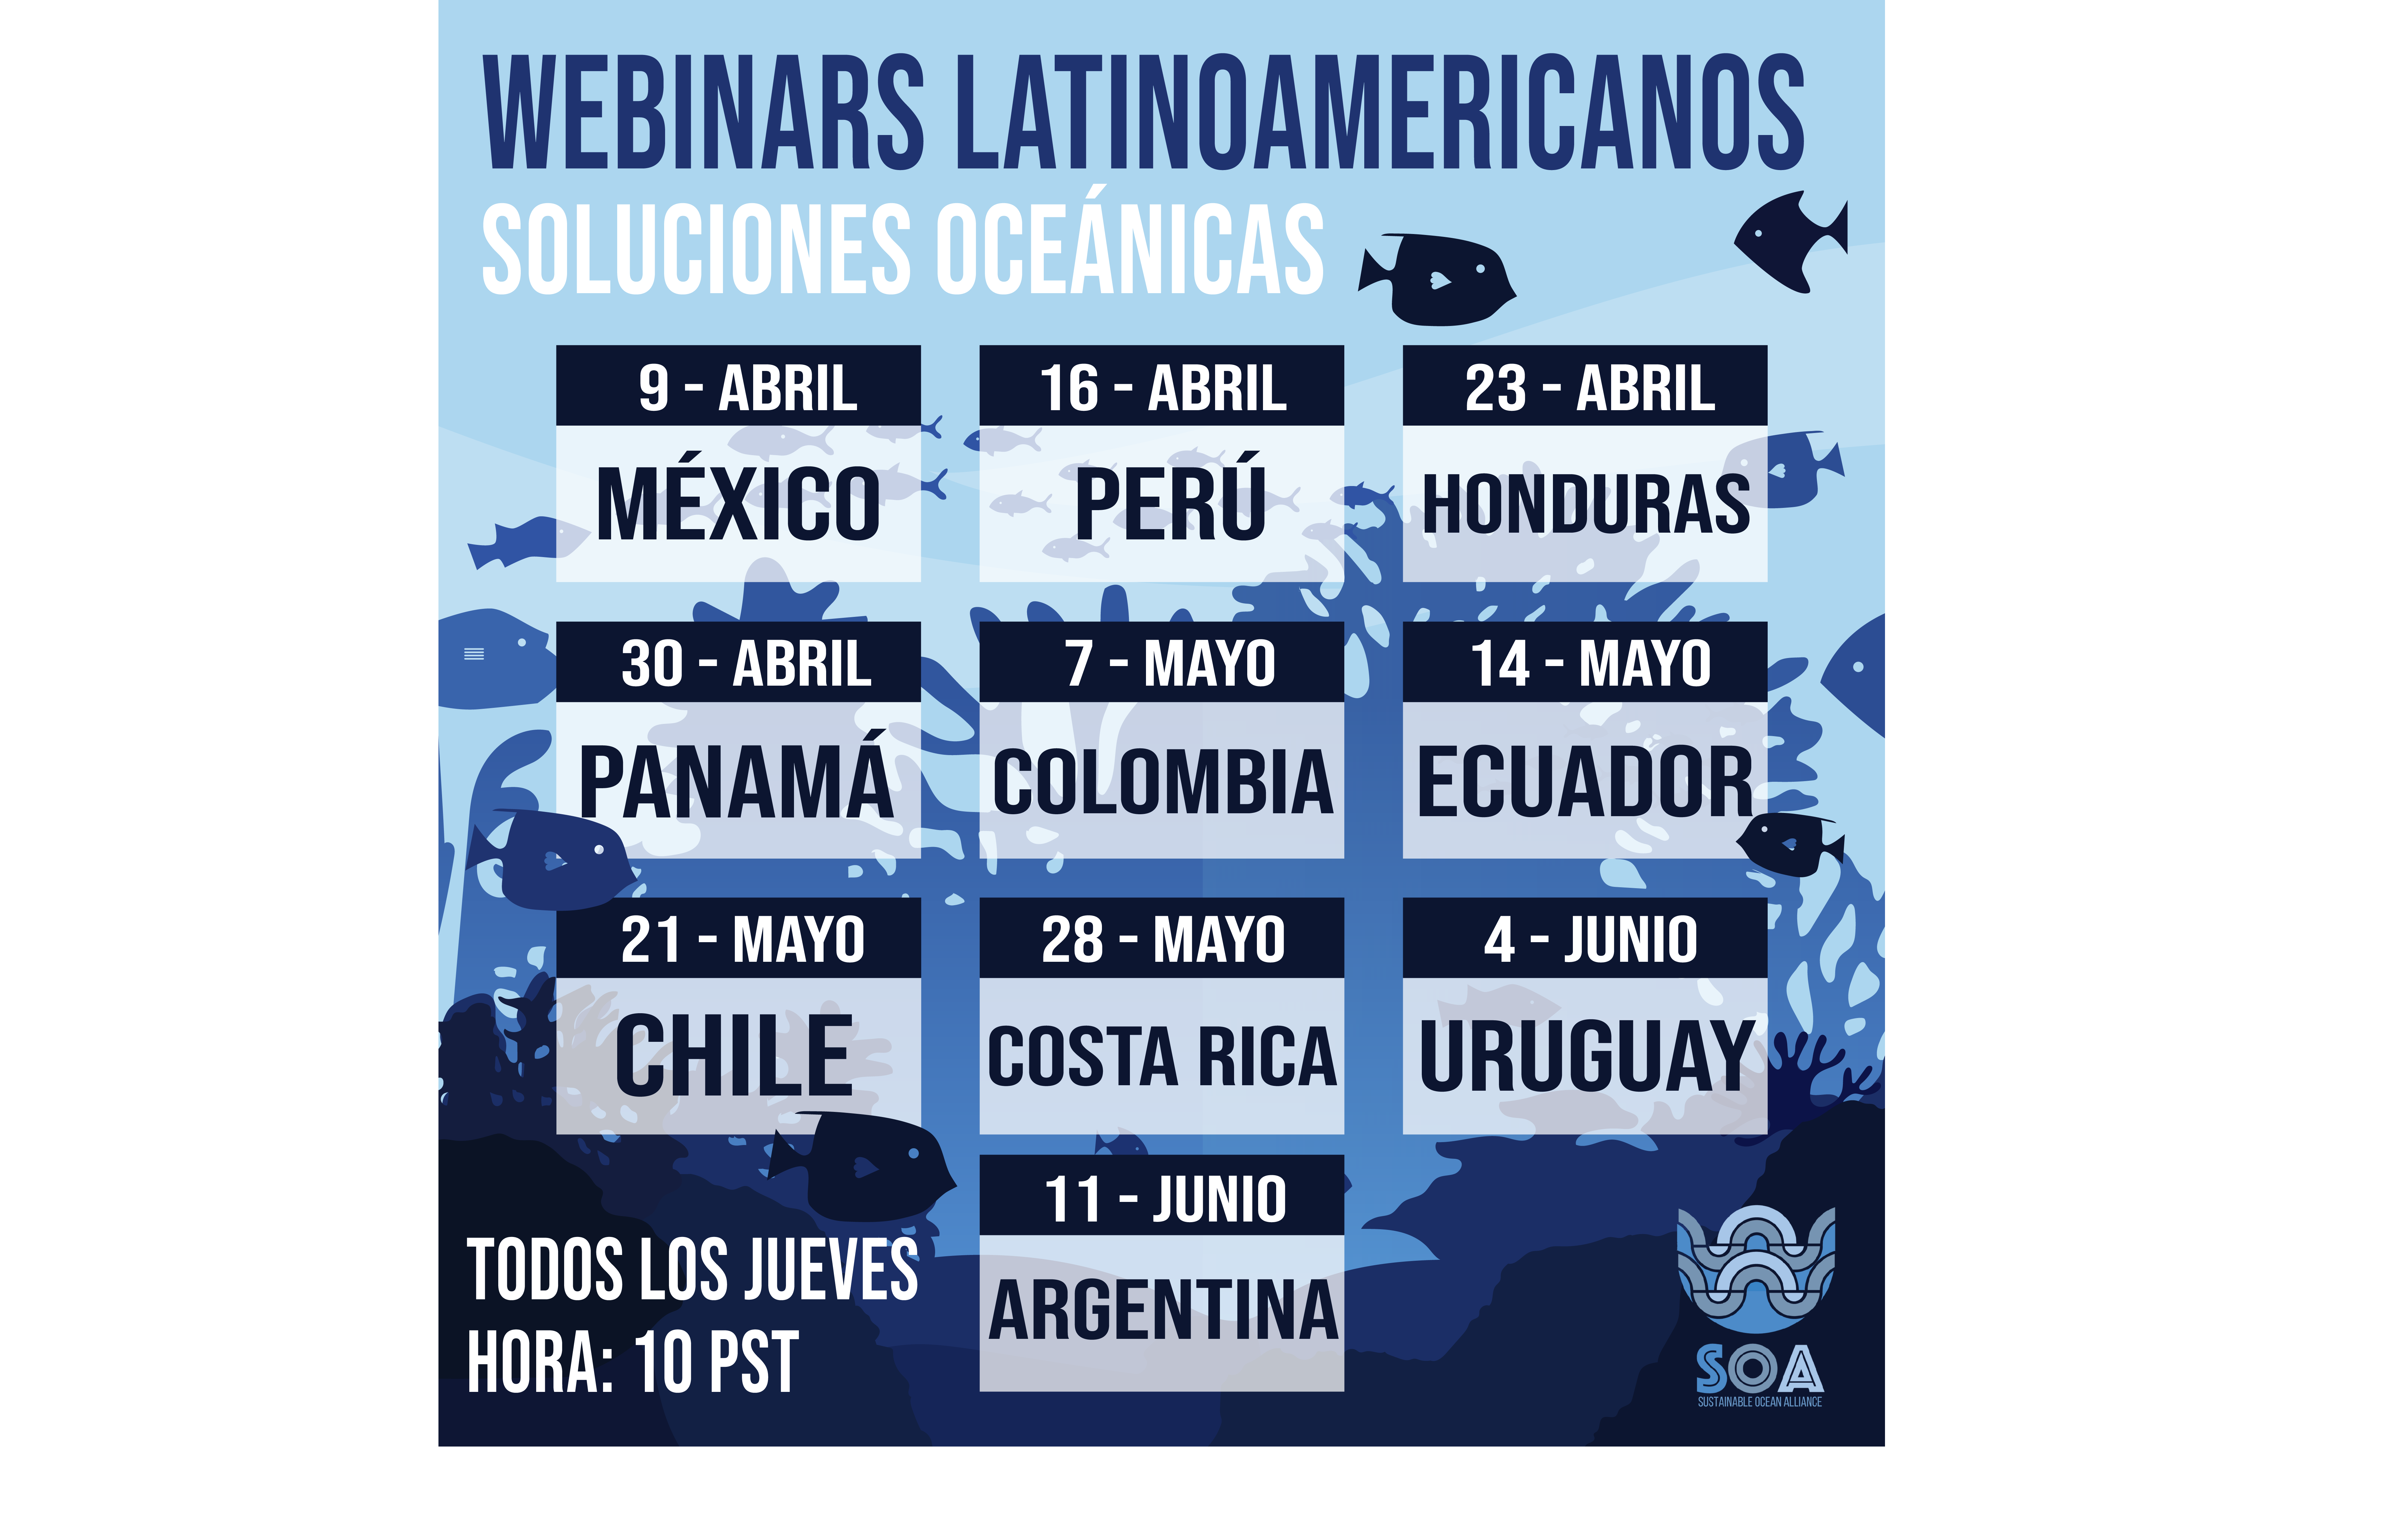 webinas latinoamericanos